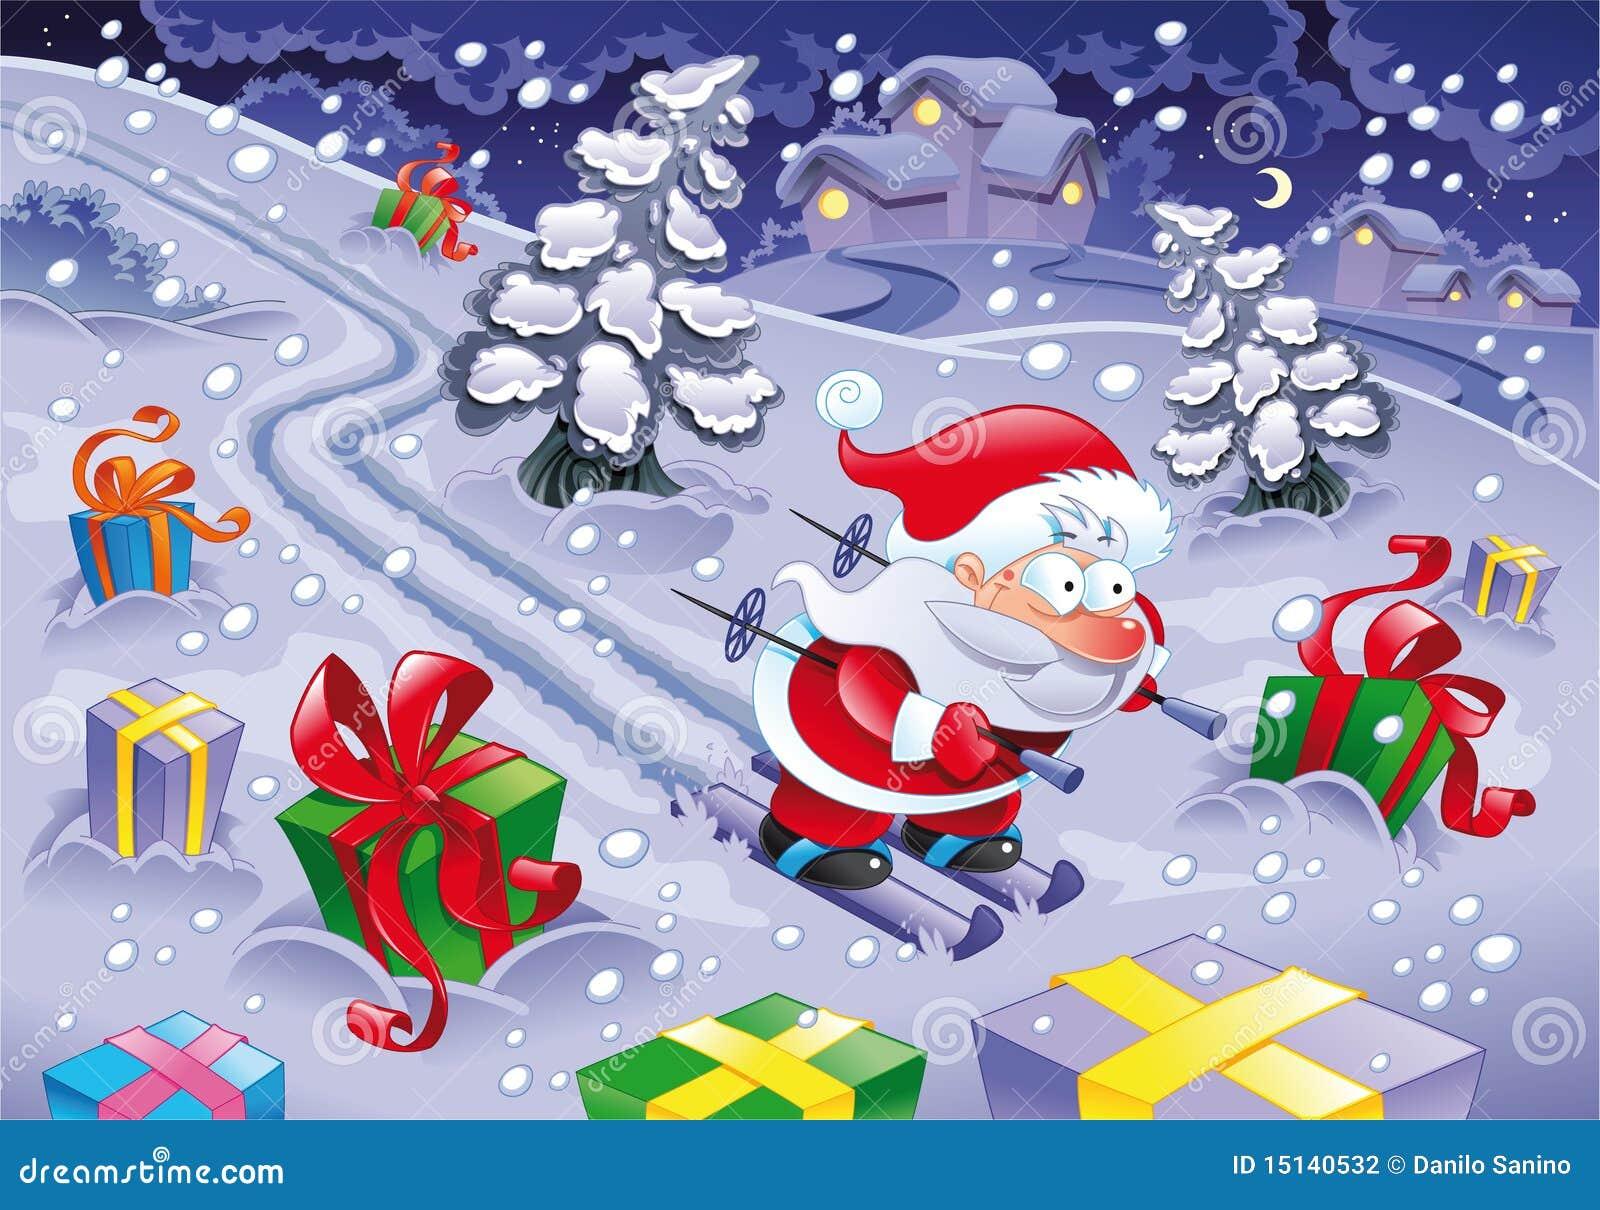 Santa Claus skiing in the night.